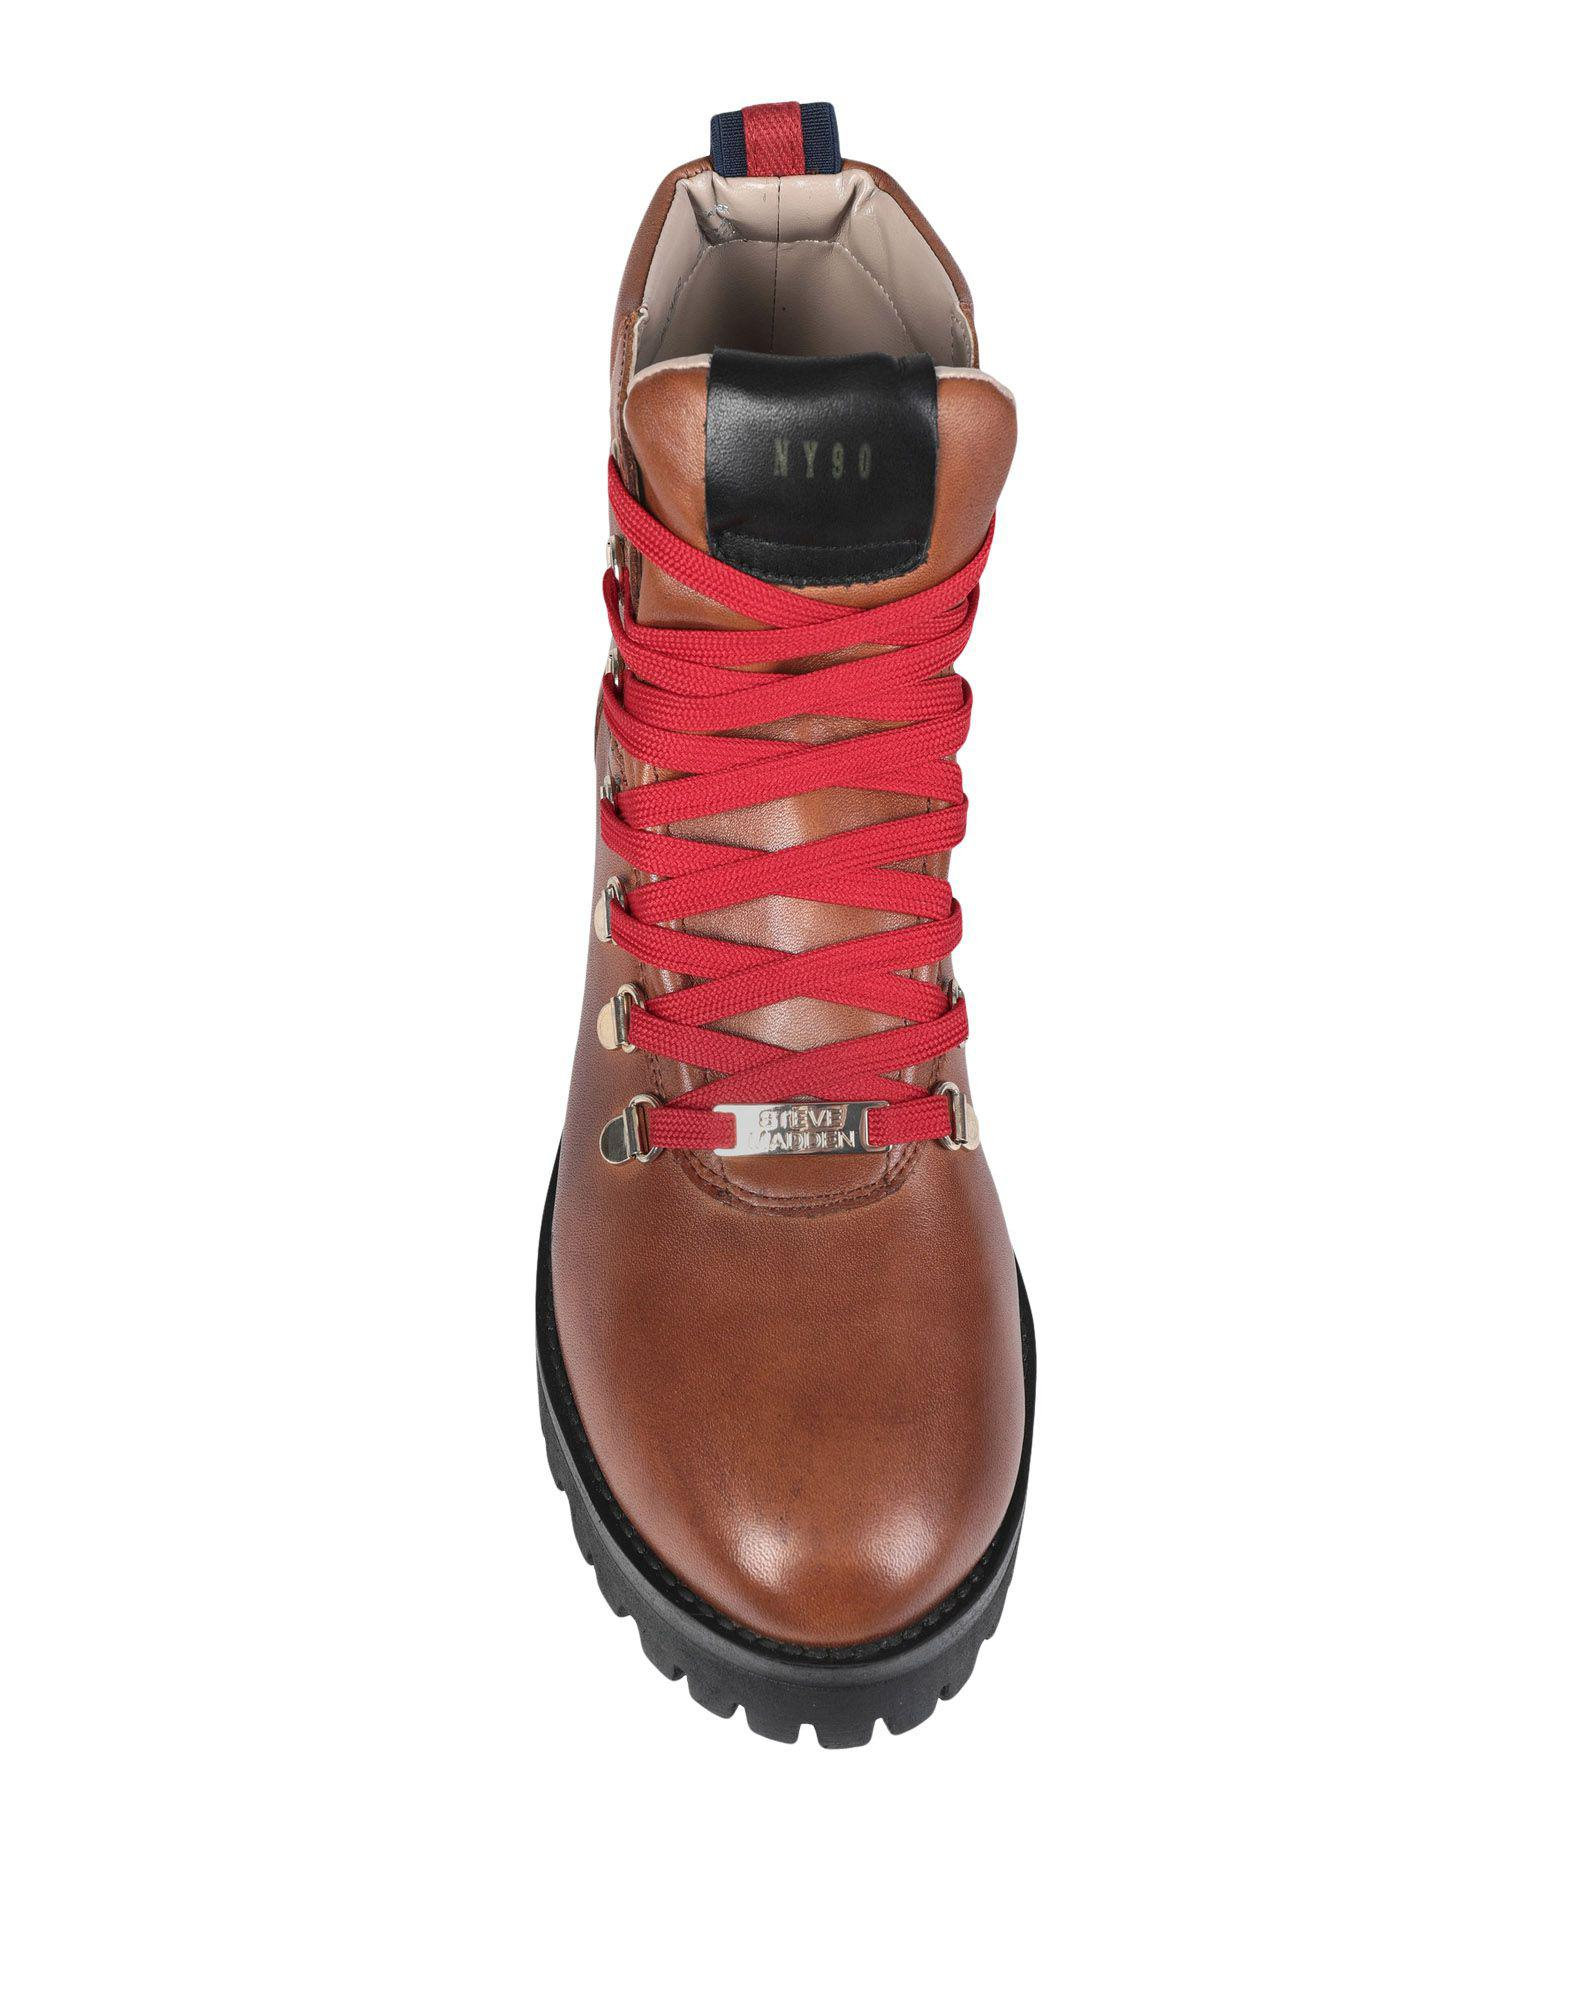 Botines de caña alta Steve Madden de Caucho de color Marrón